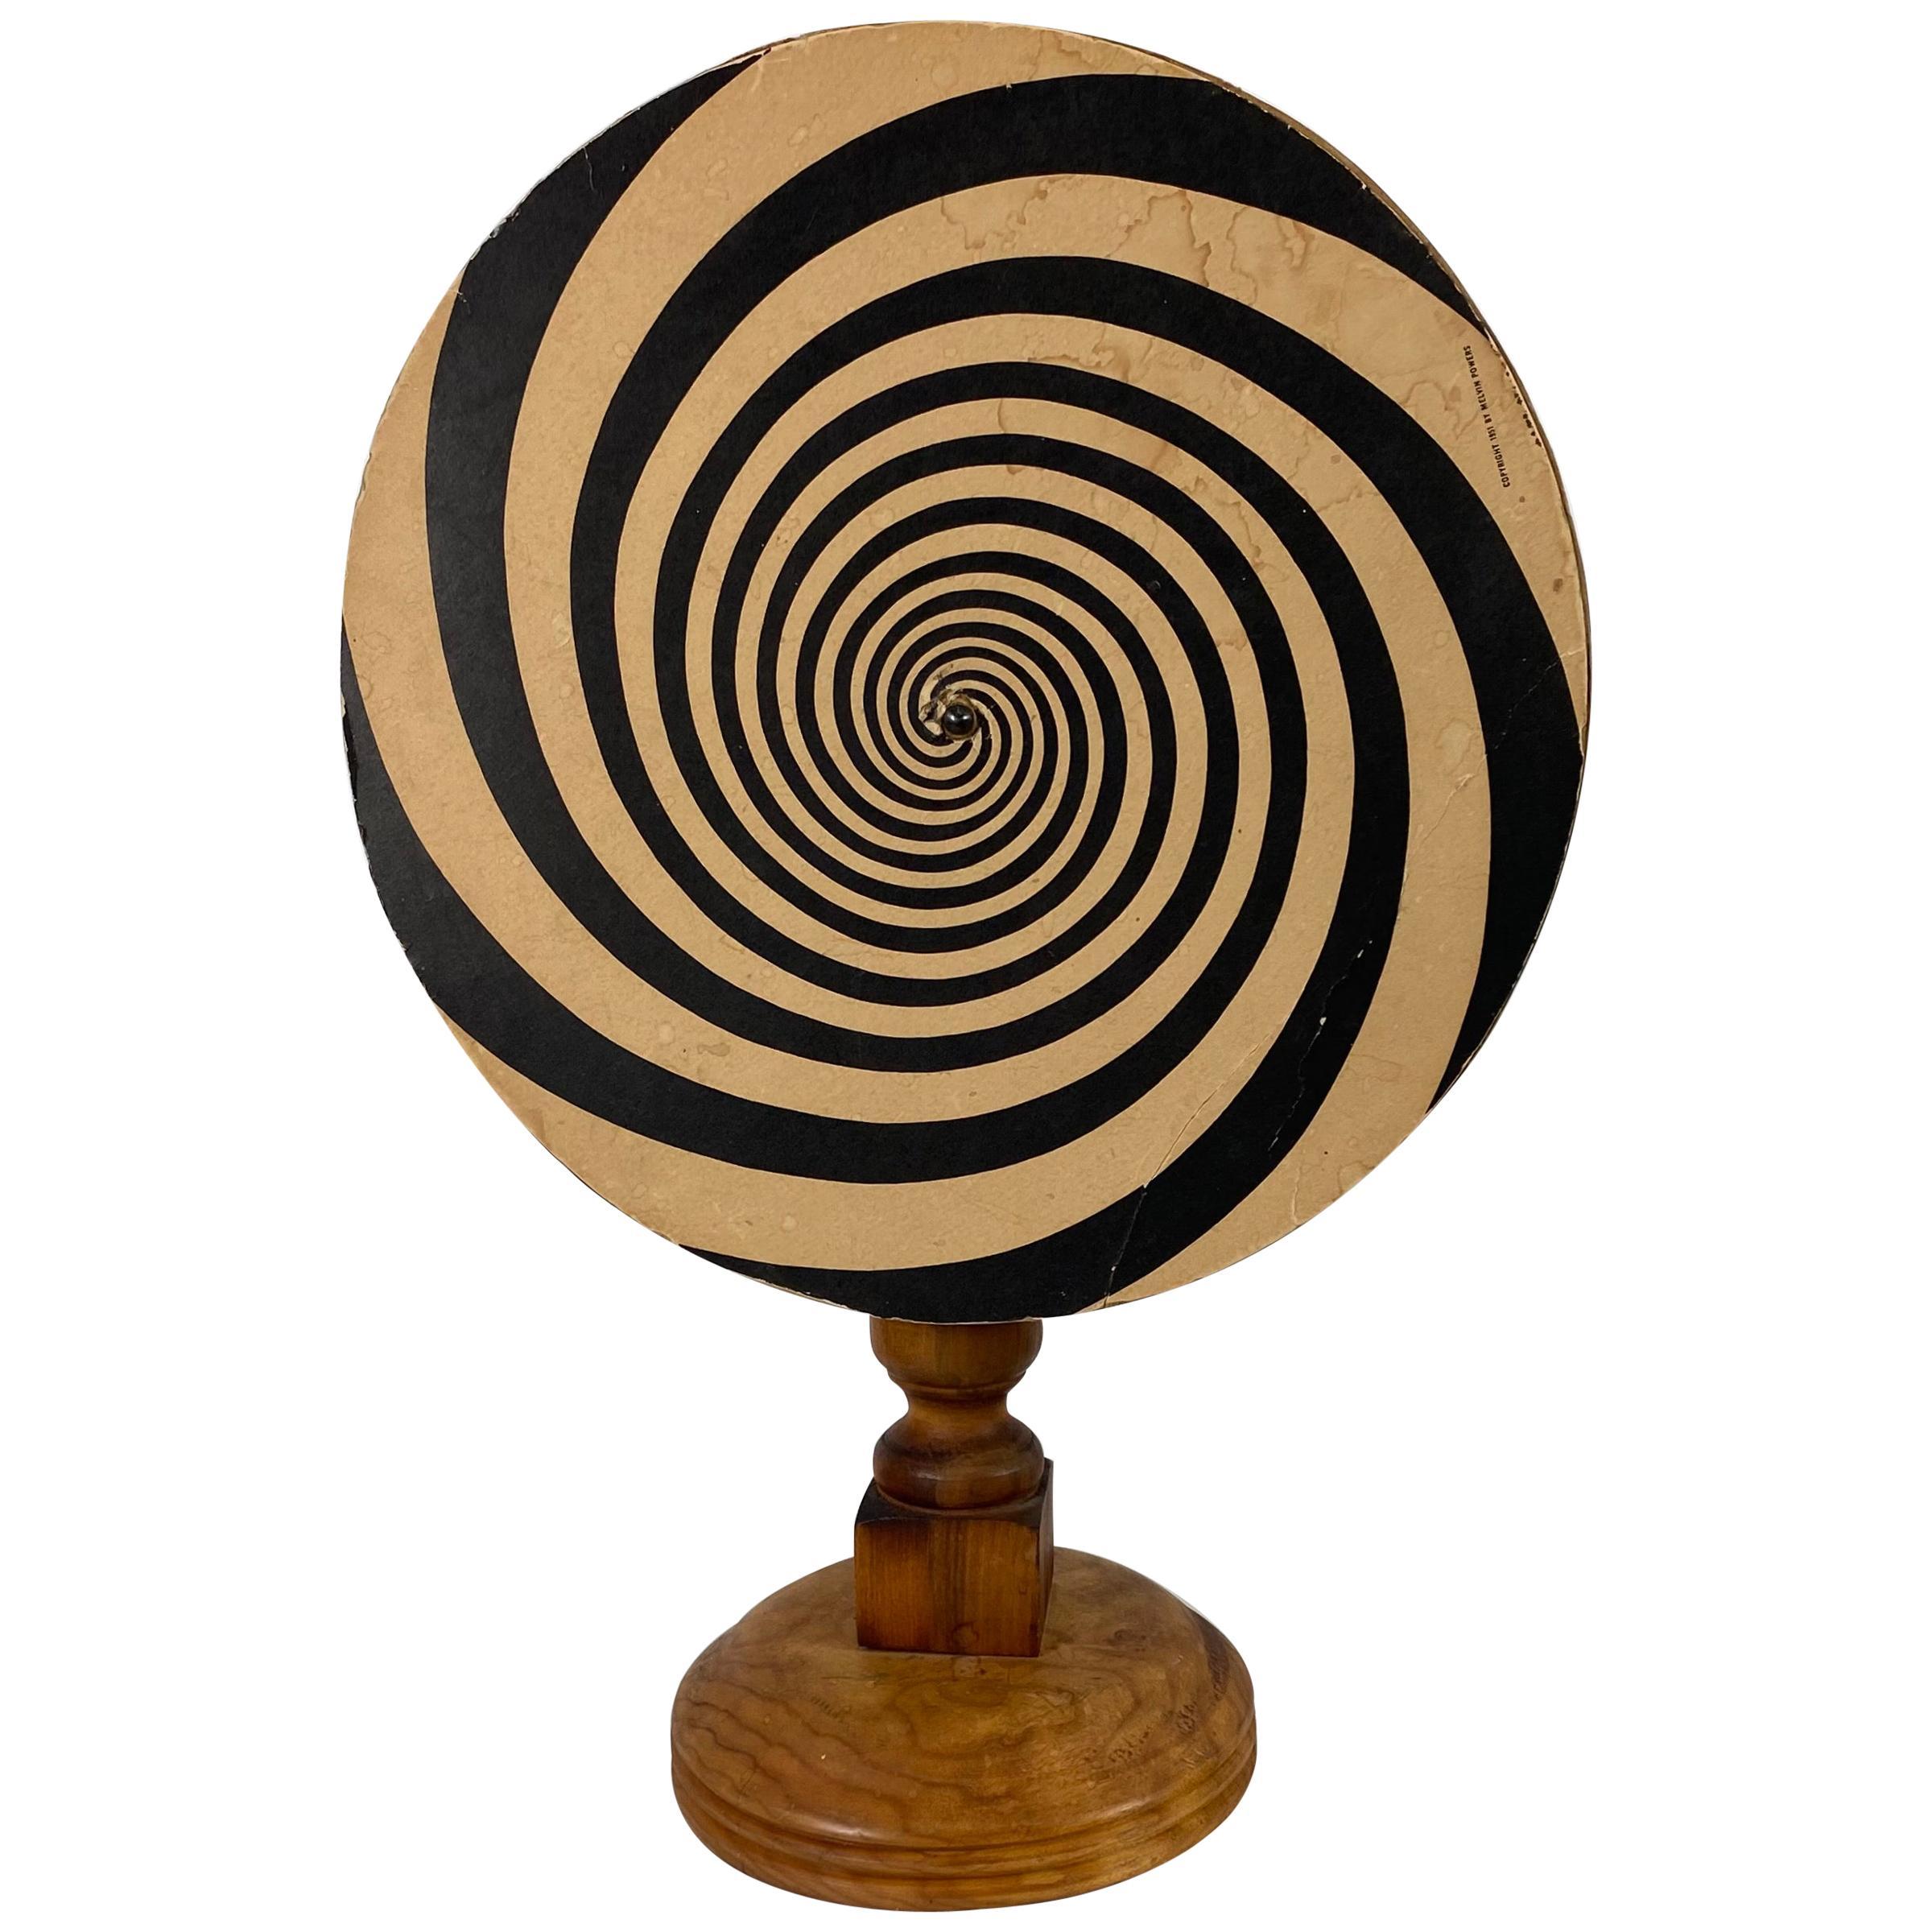 Unusual Mesmerizing Hand Built Hypnotic Wheel, by Melvin Powers, 1951